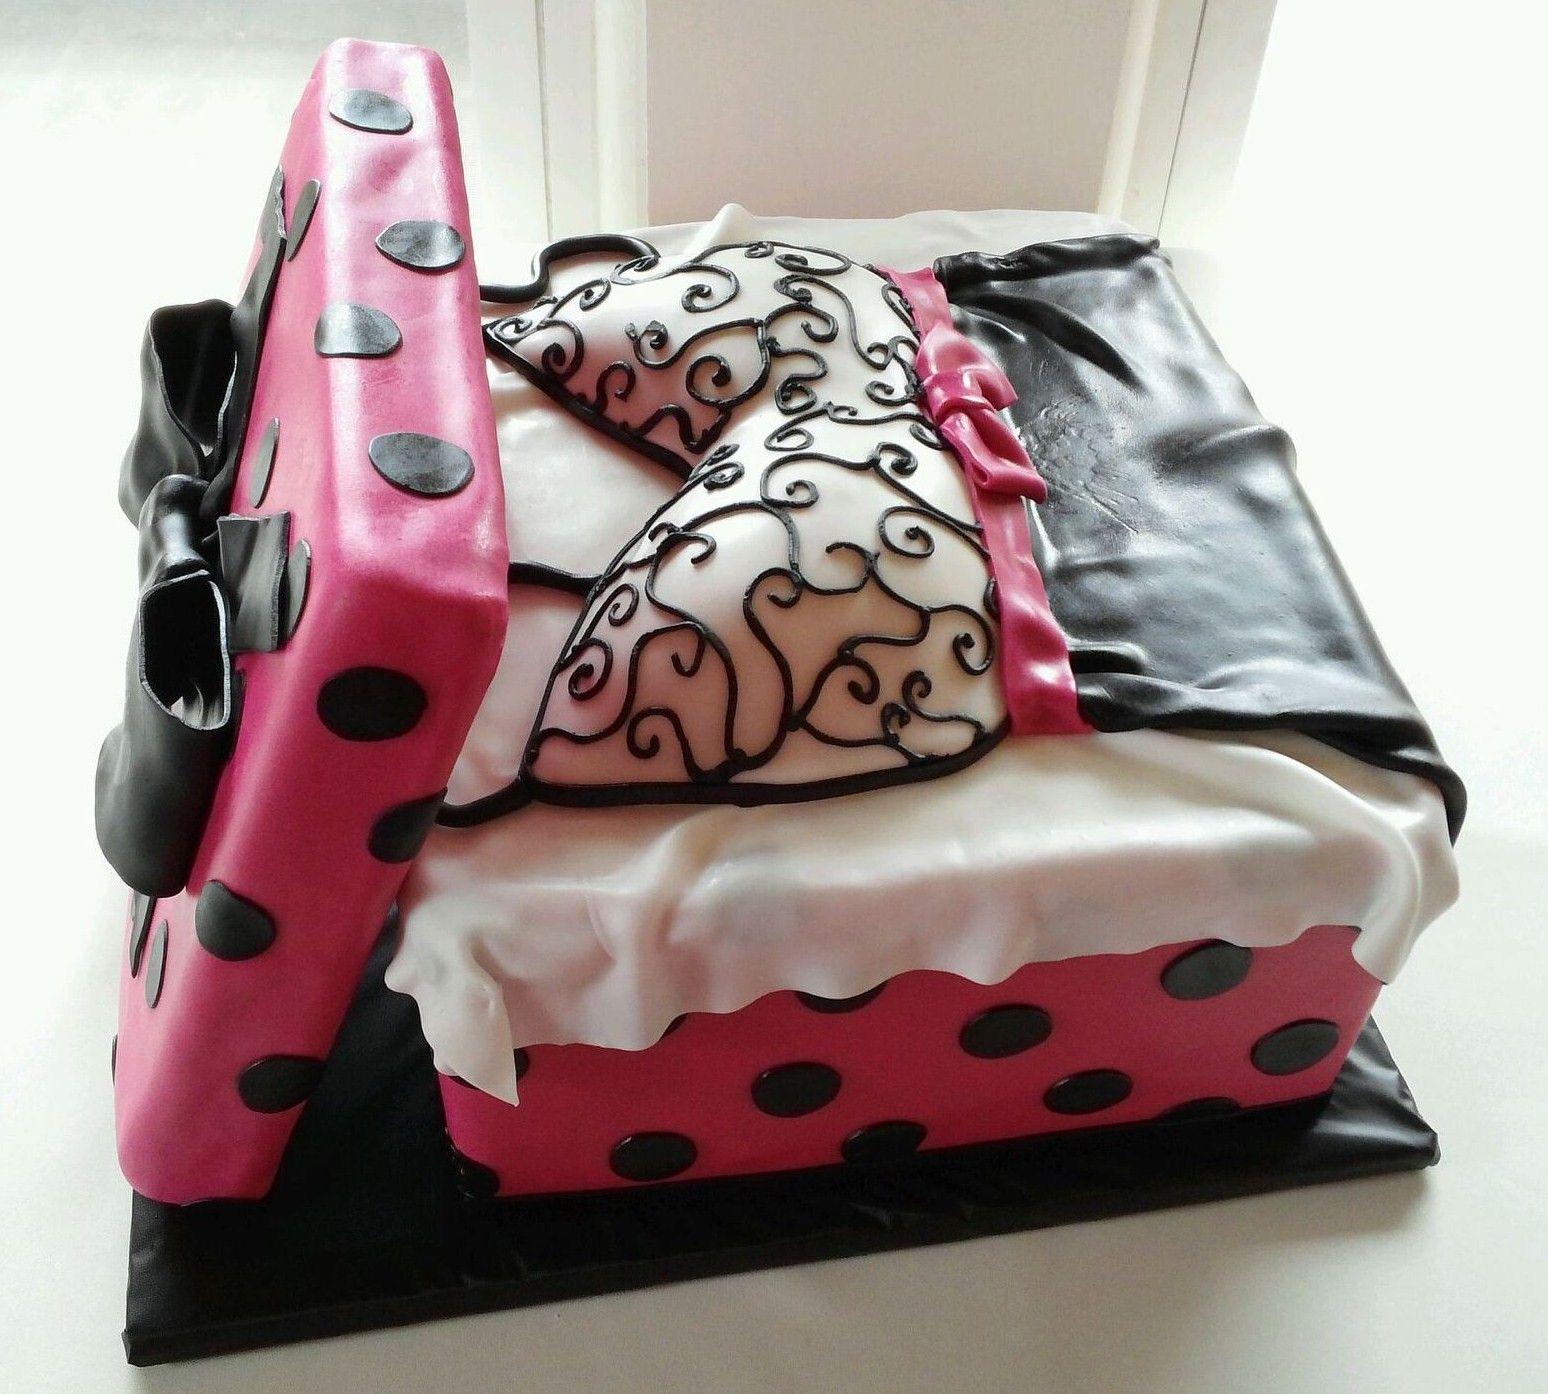 Bridal Shower Cake Lingerie in a Gift Box